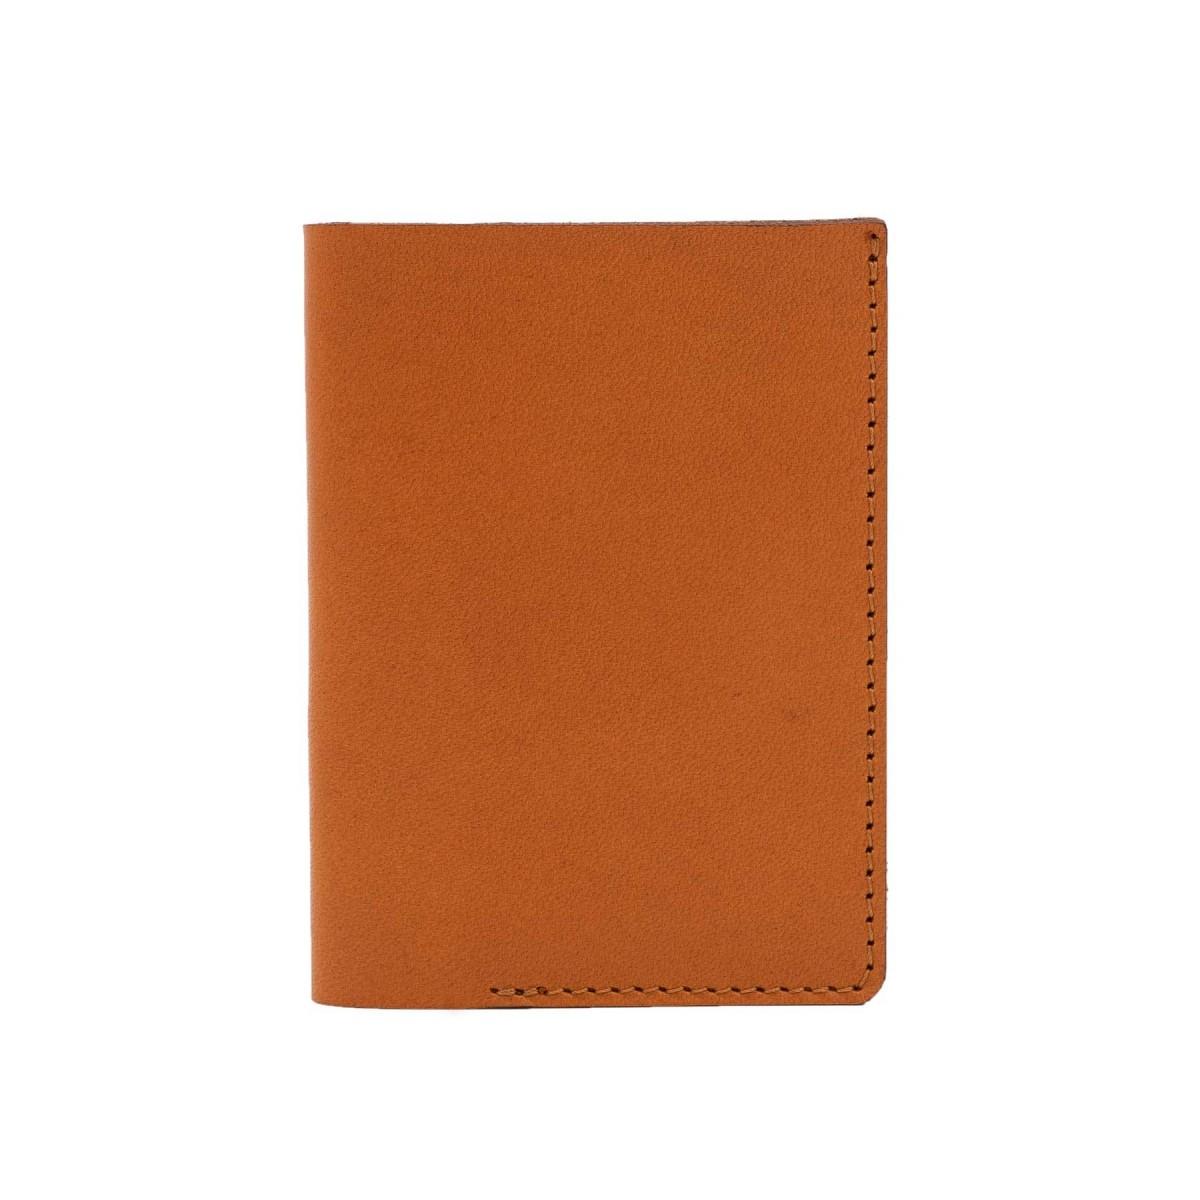 Mini Portemonnaie in cognac - aus premium pflanzlich gegerbtem Leder